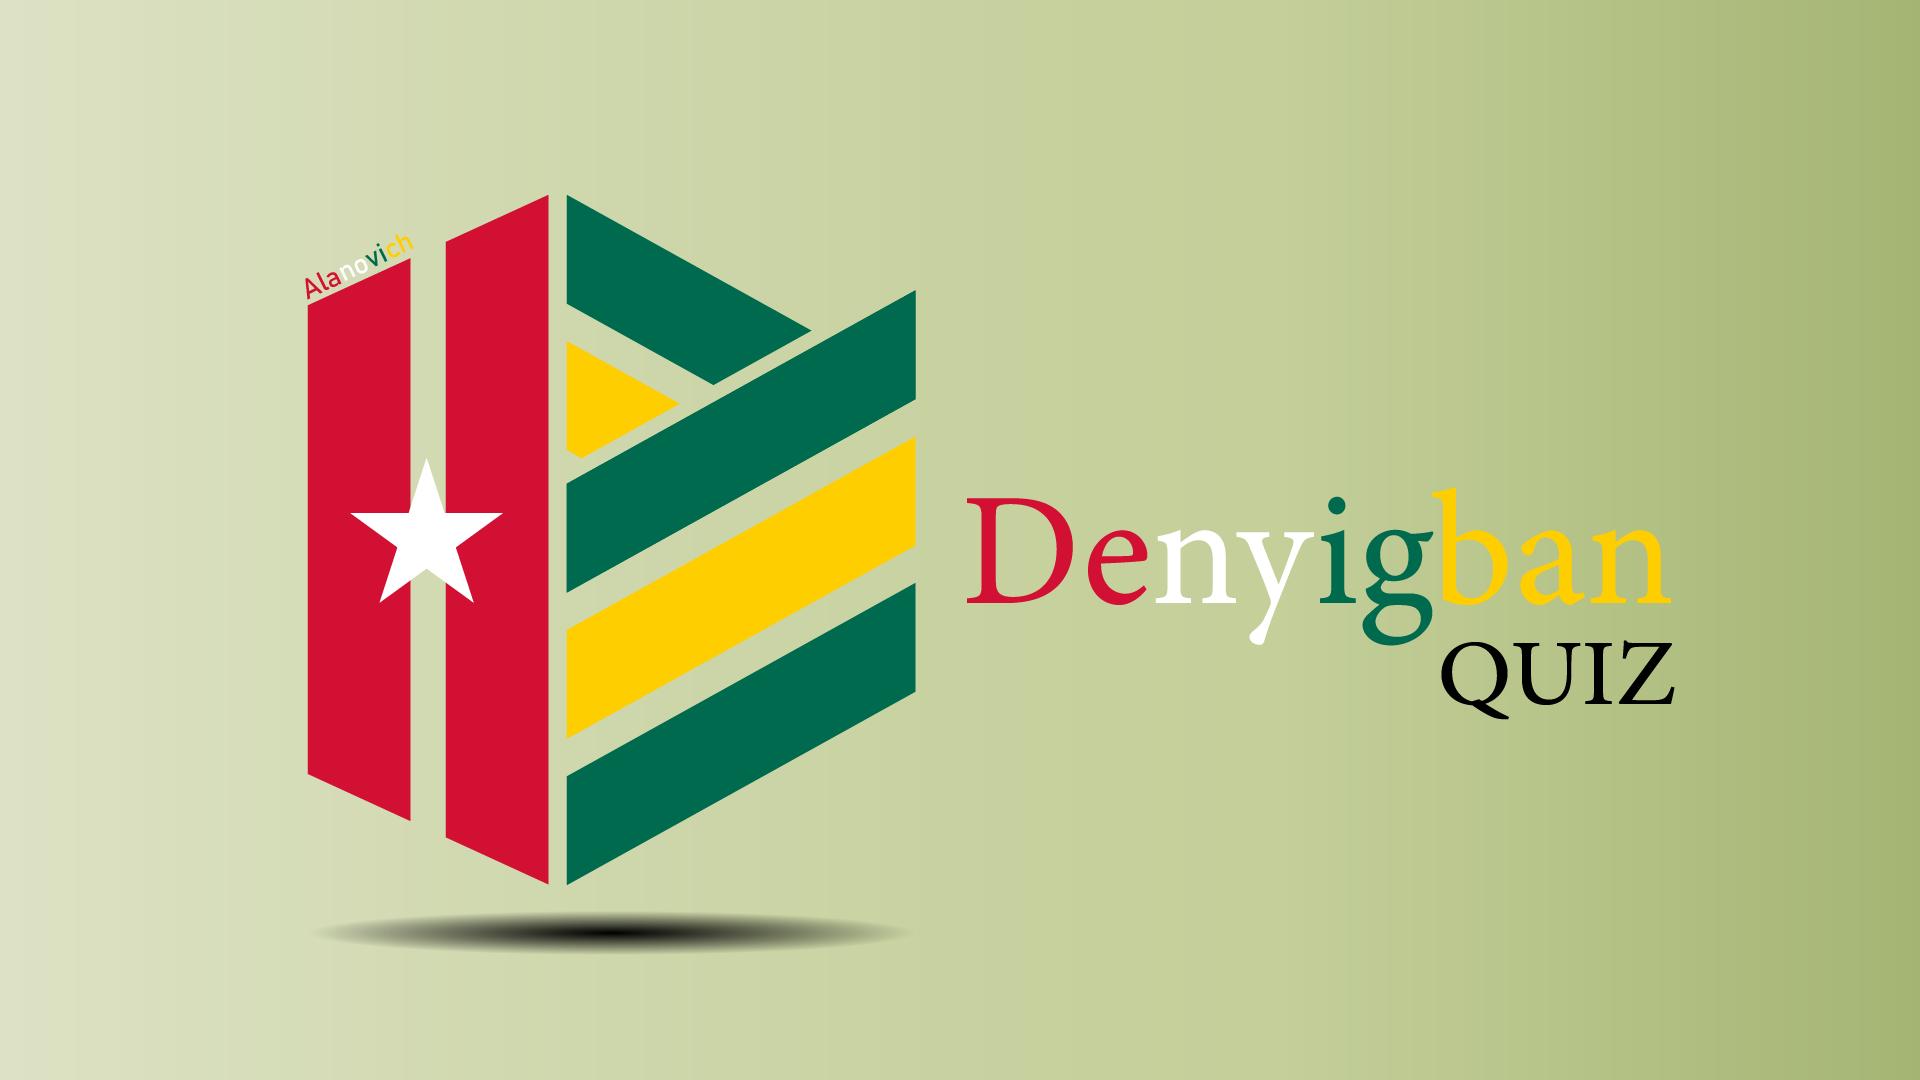 Logo de l'application DenyigbanQUiz